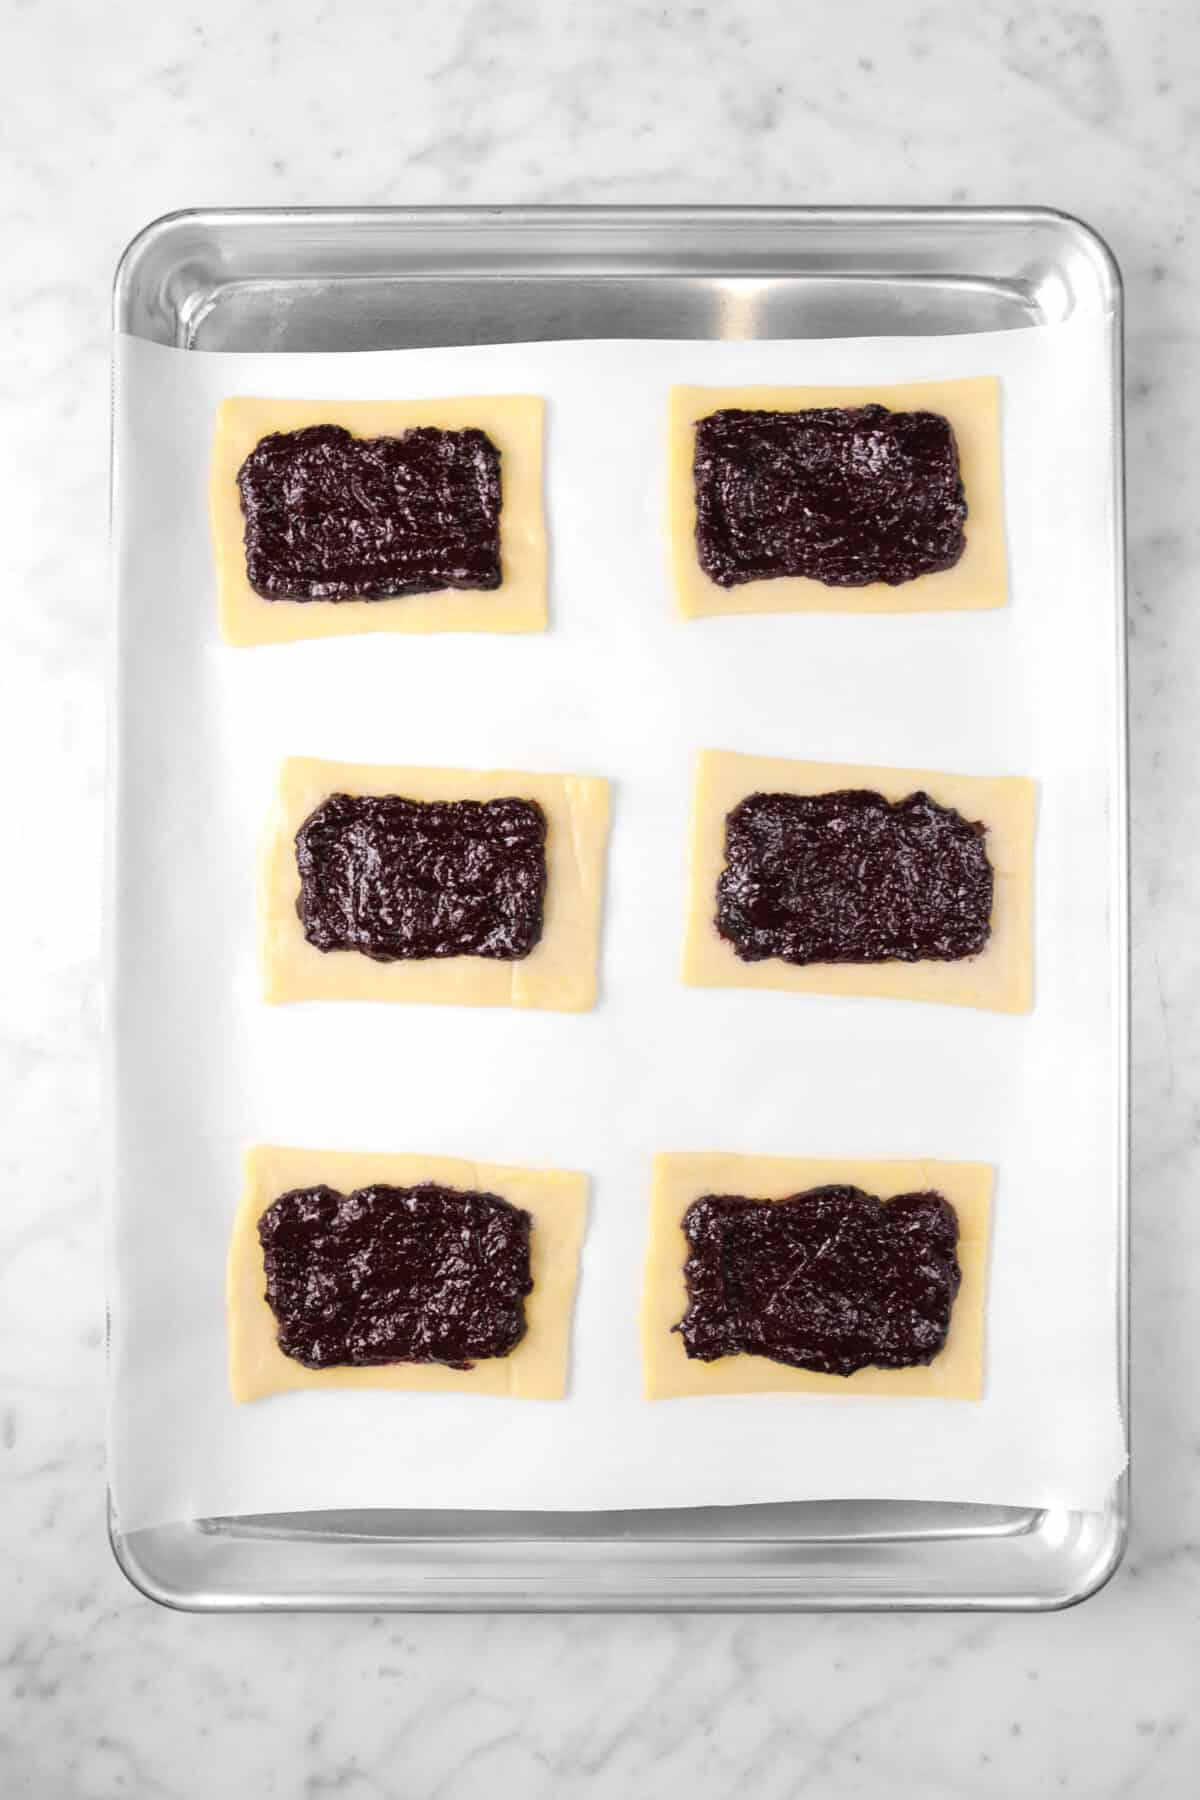 jam spread in the centers of pop tarts